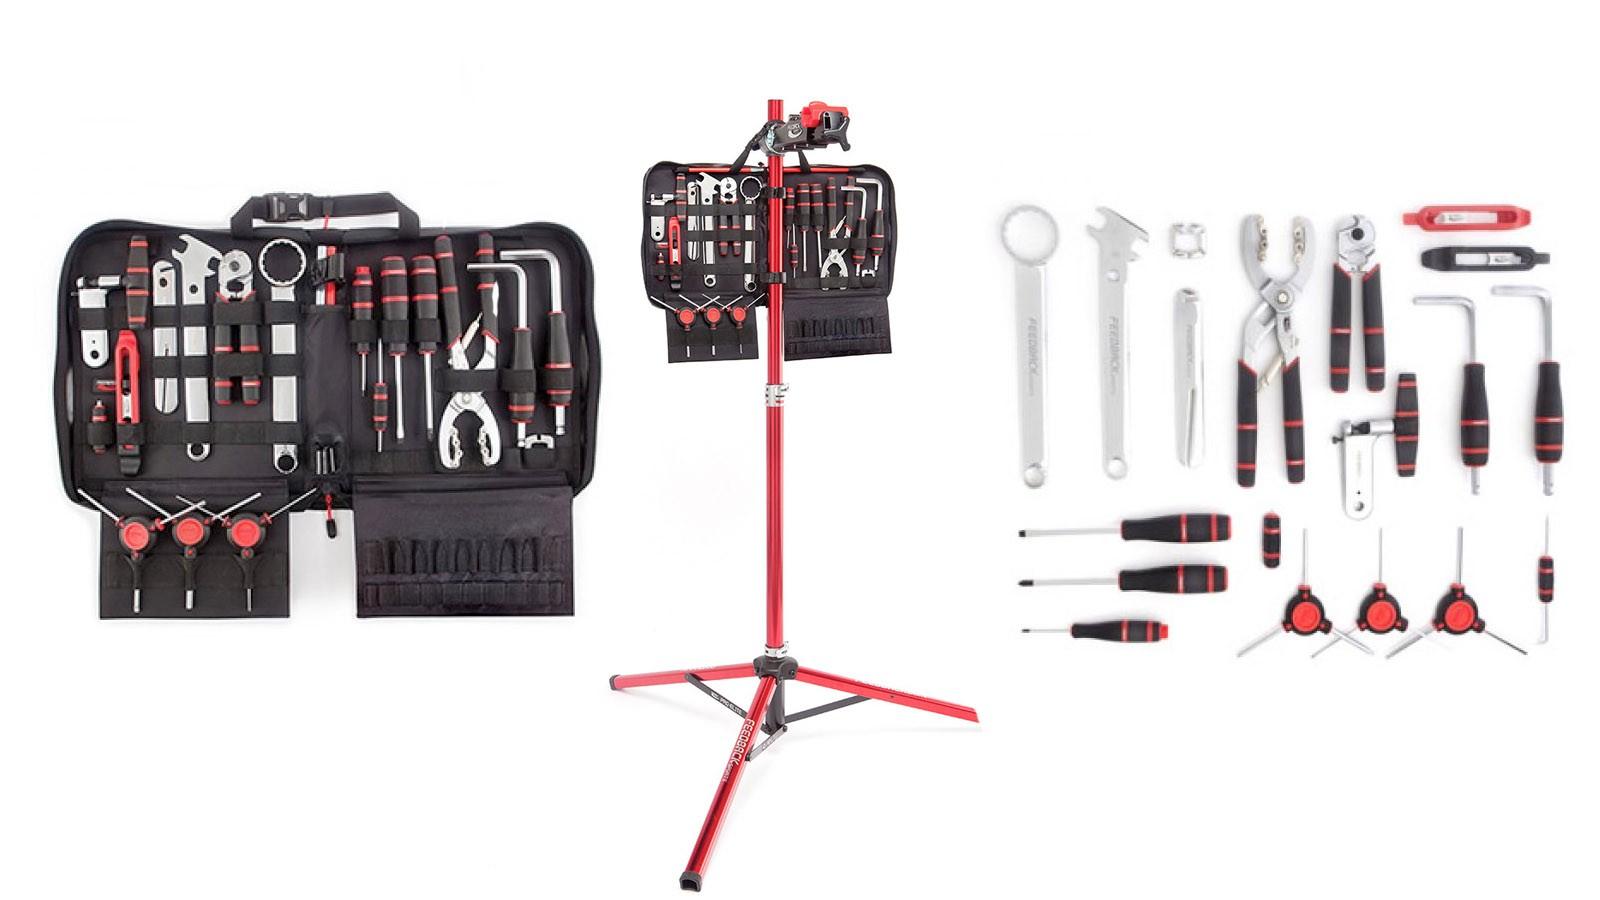 Feedback Sports Team Edition toolkit will make last-minute repairs a bit less stressful